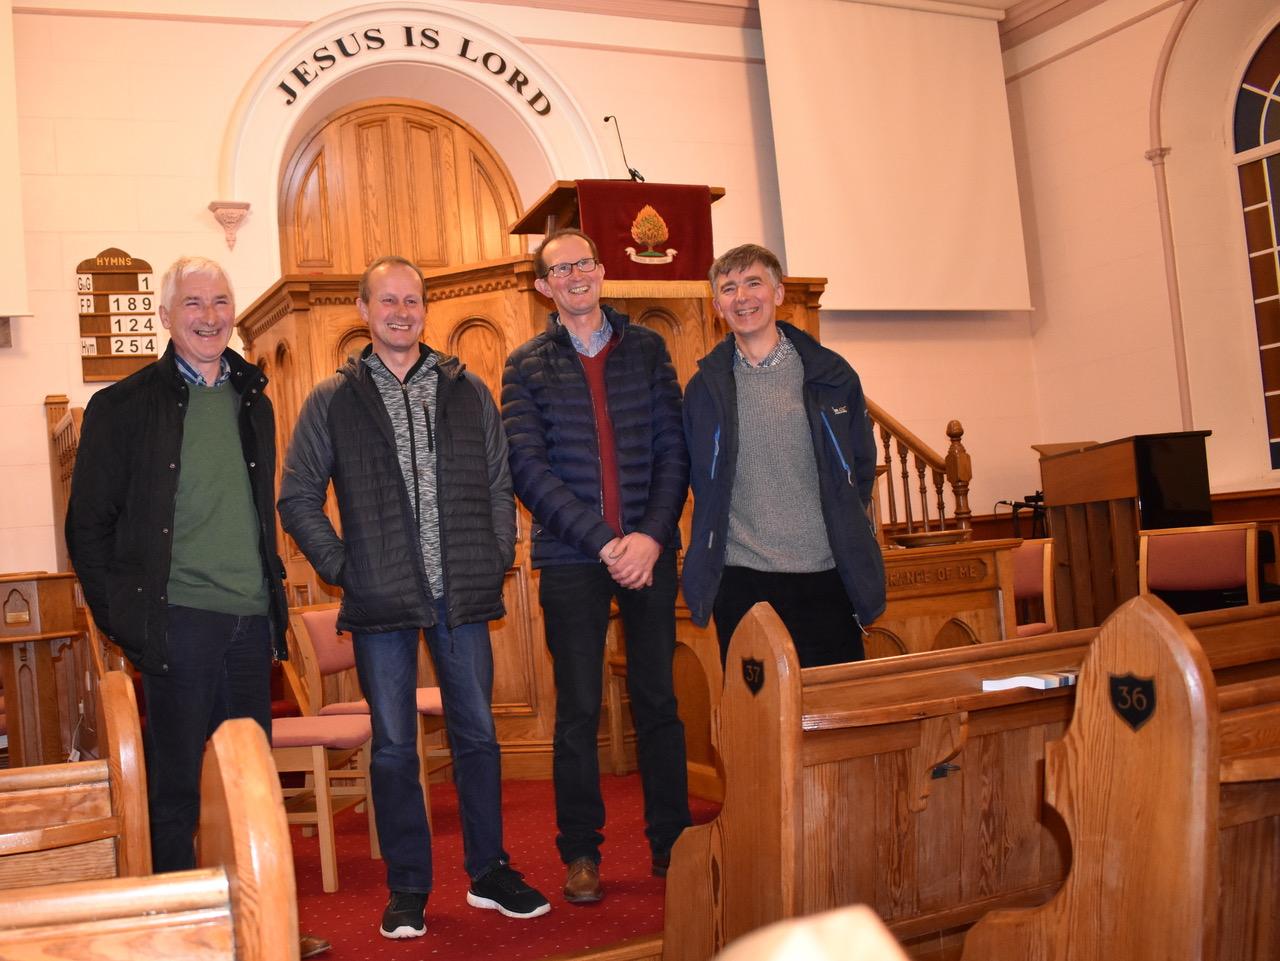 (left to right) David Lamberton, Trevor Fergusson, Ivan Fergusson and James Lamberton.